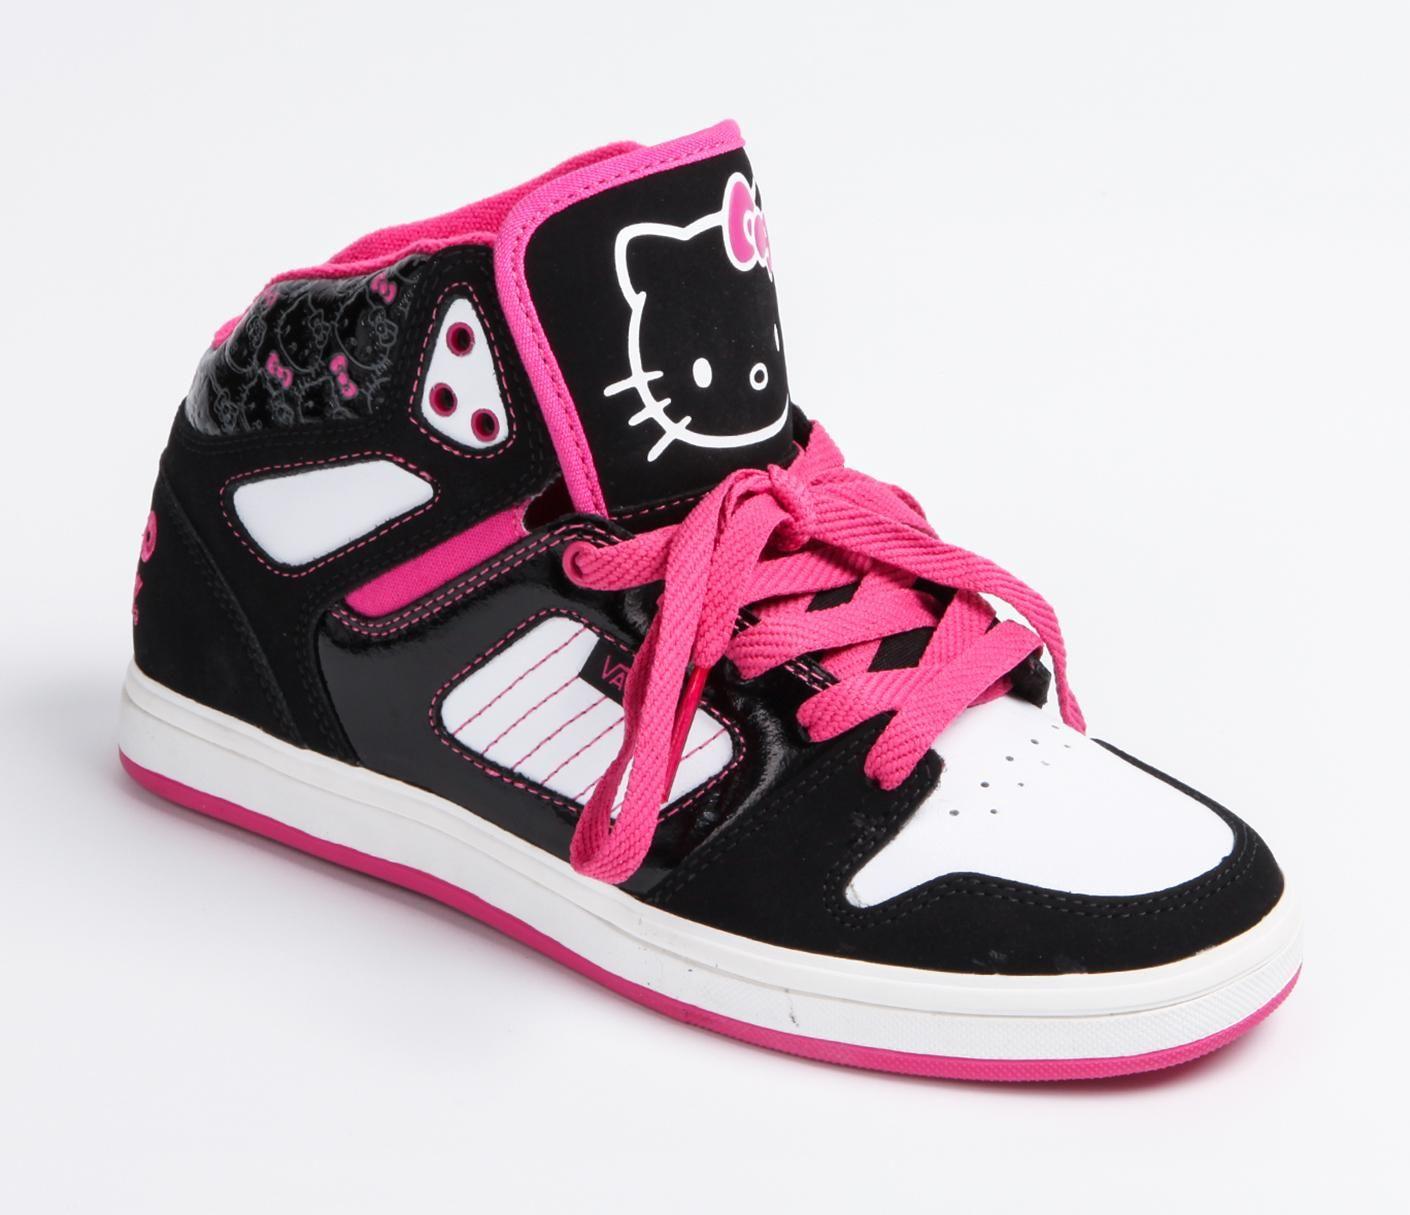 26699406ebe VANS x Hello Kitty Authentic Allred Hi  Blk Wh Calçados Infantis